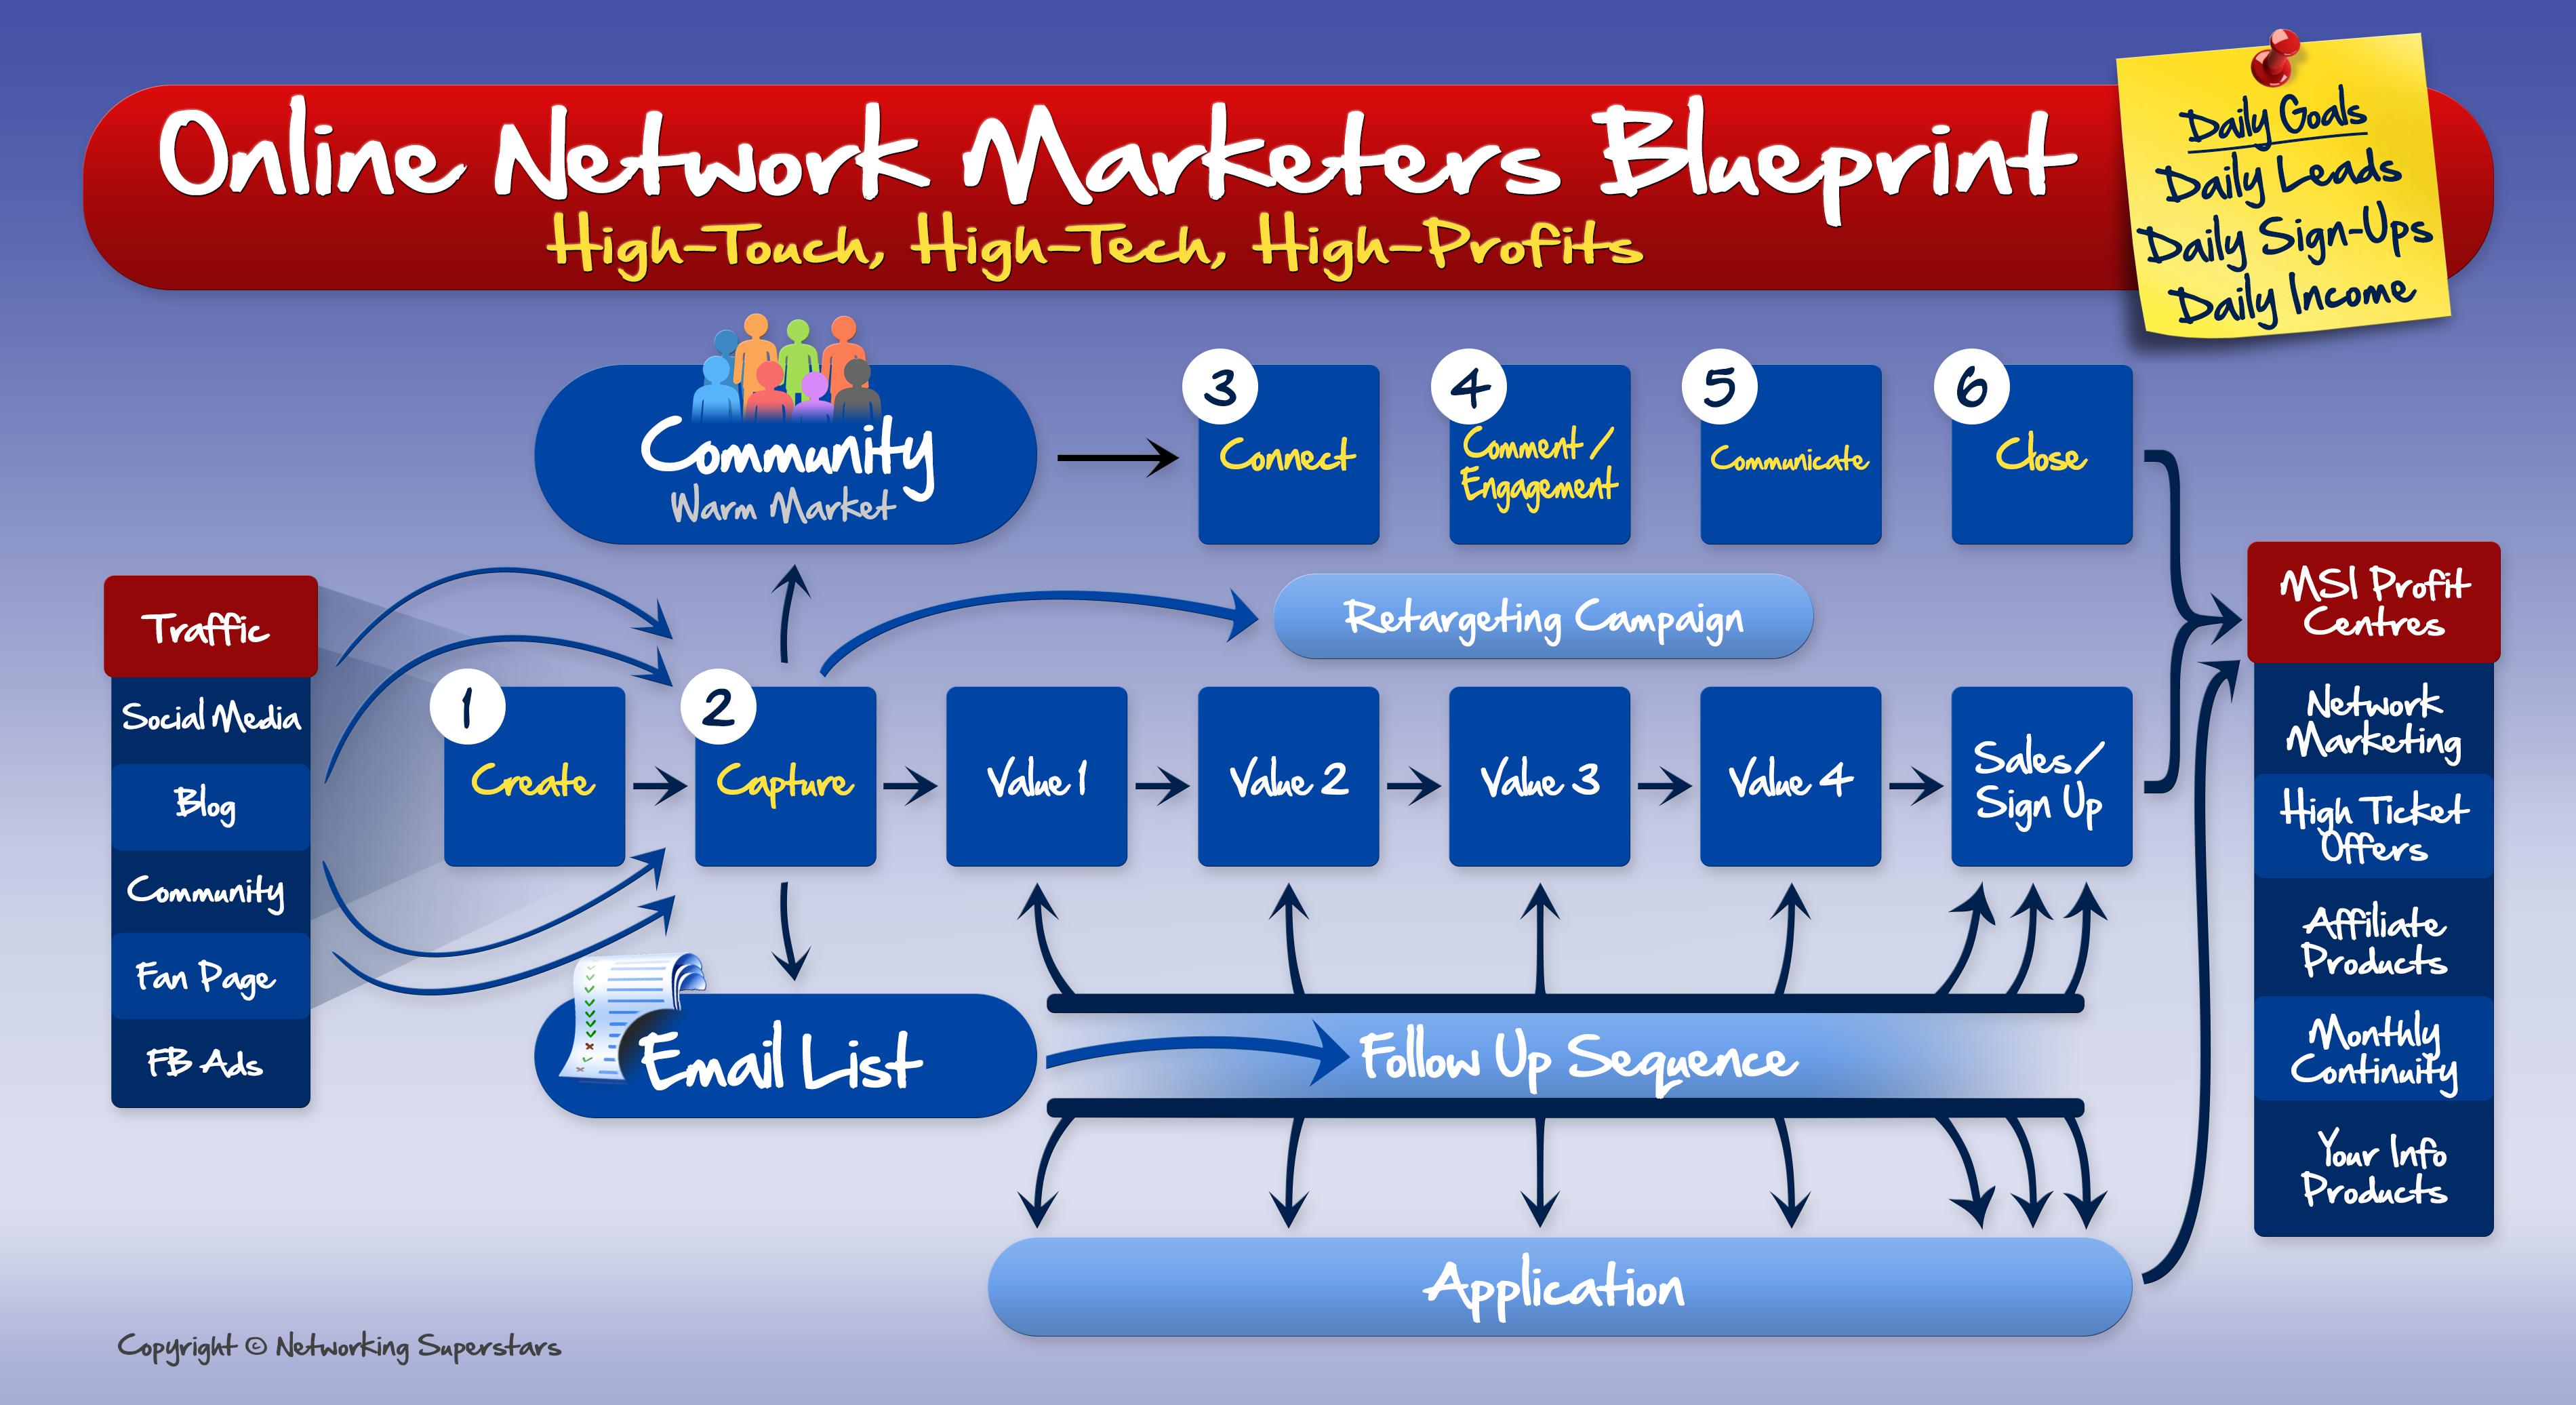 Online network marketers blueprint the architecture design imanada online network marketers blueprint the architecture design imanada stock video footage malvernweather Gallery